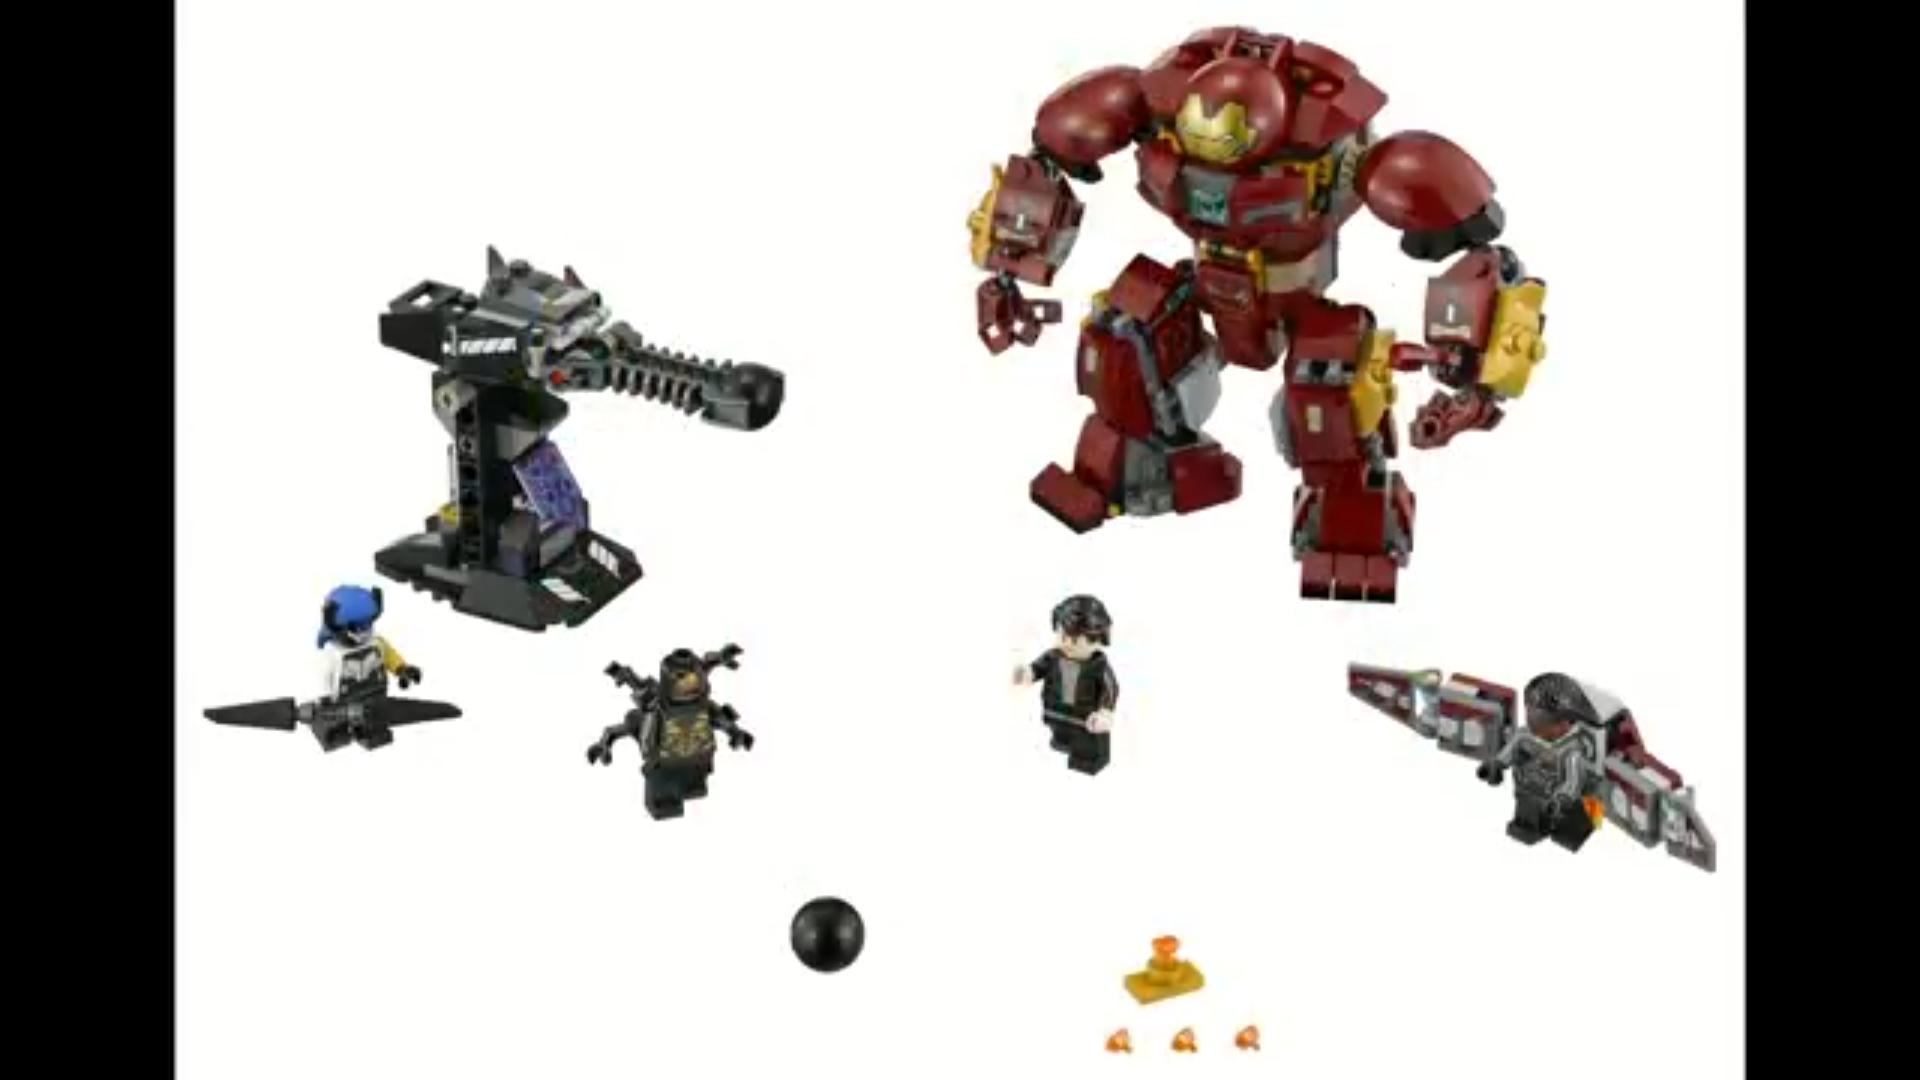 Infinity War Spoilers Toys